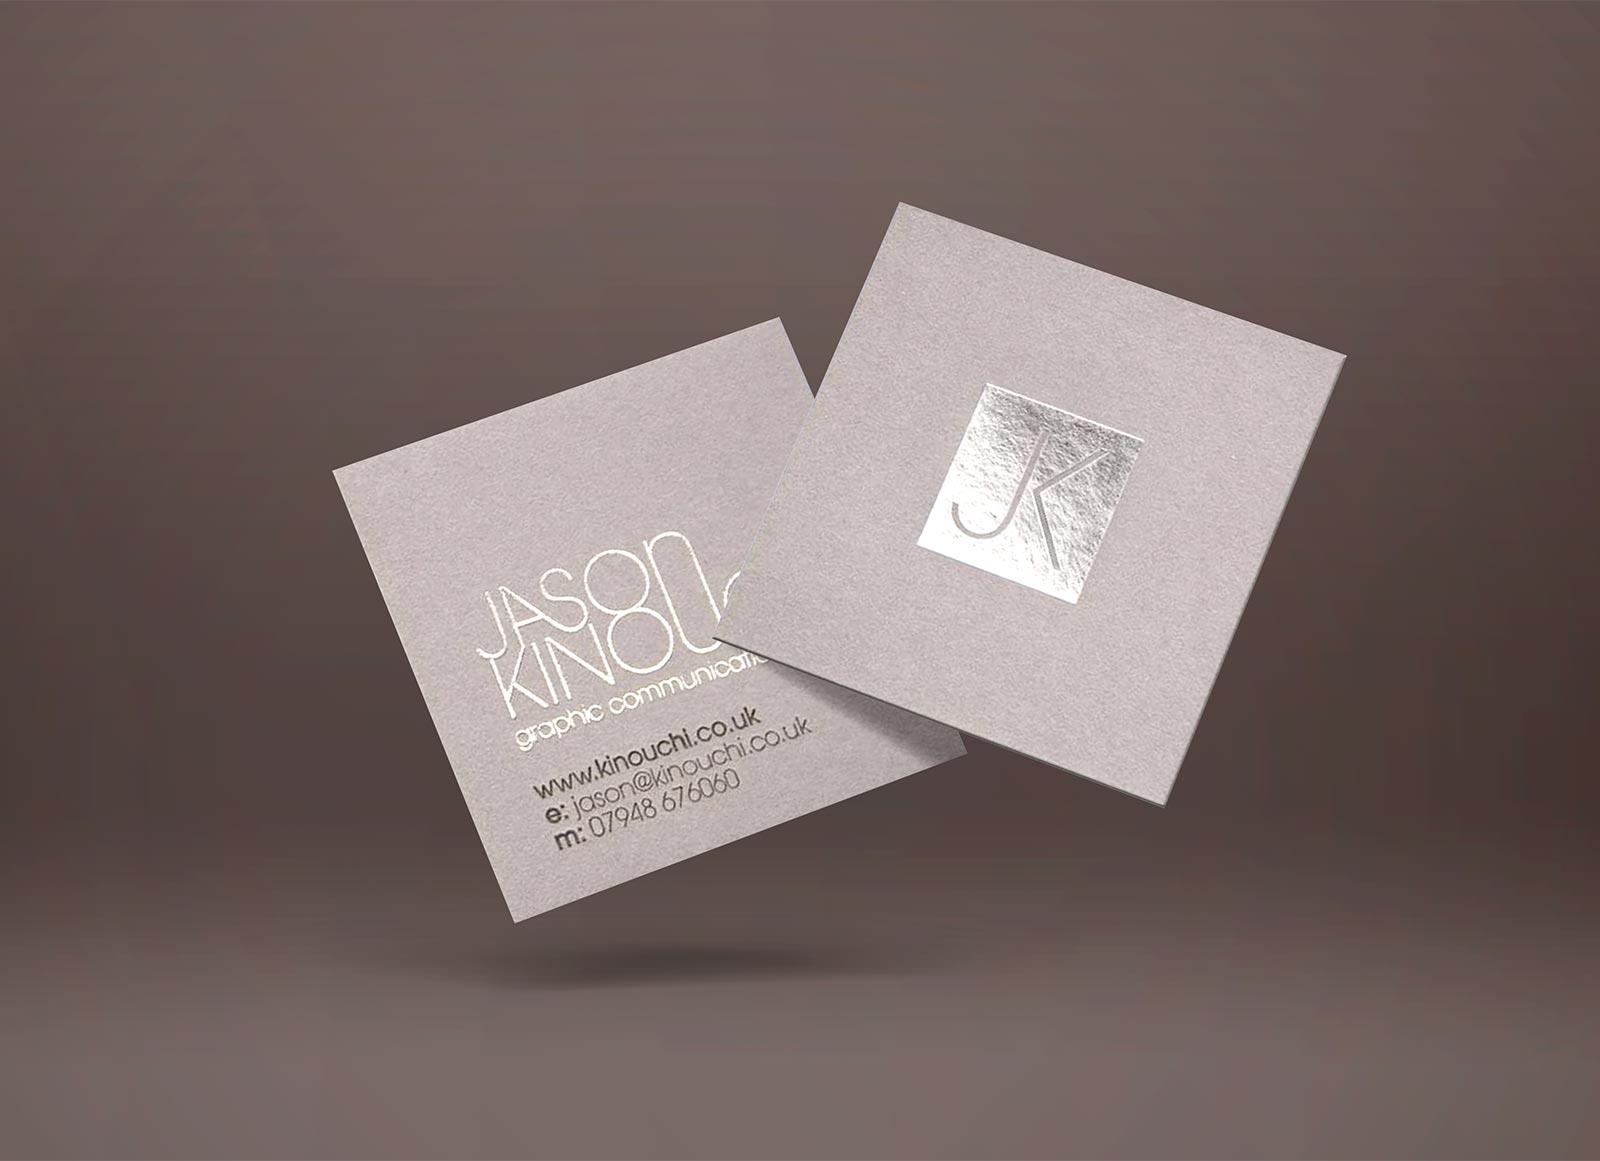 Free-Falling-Square-Business-Card-Mockup-PSD